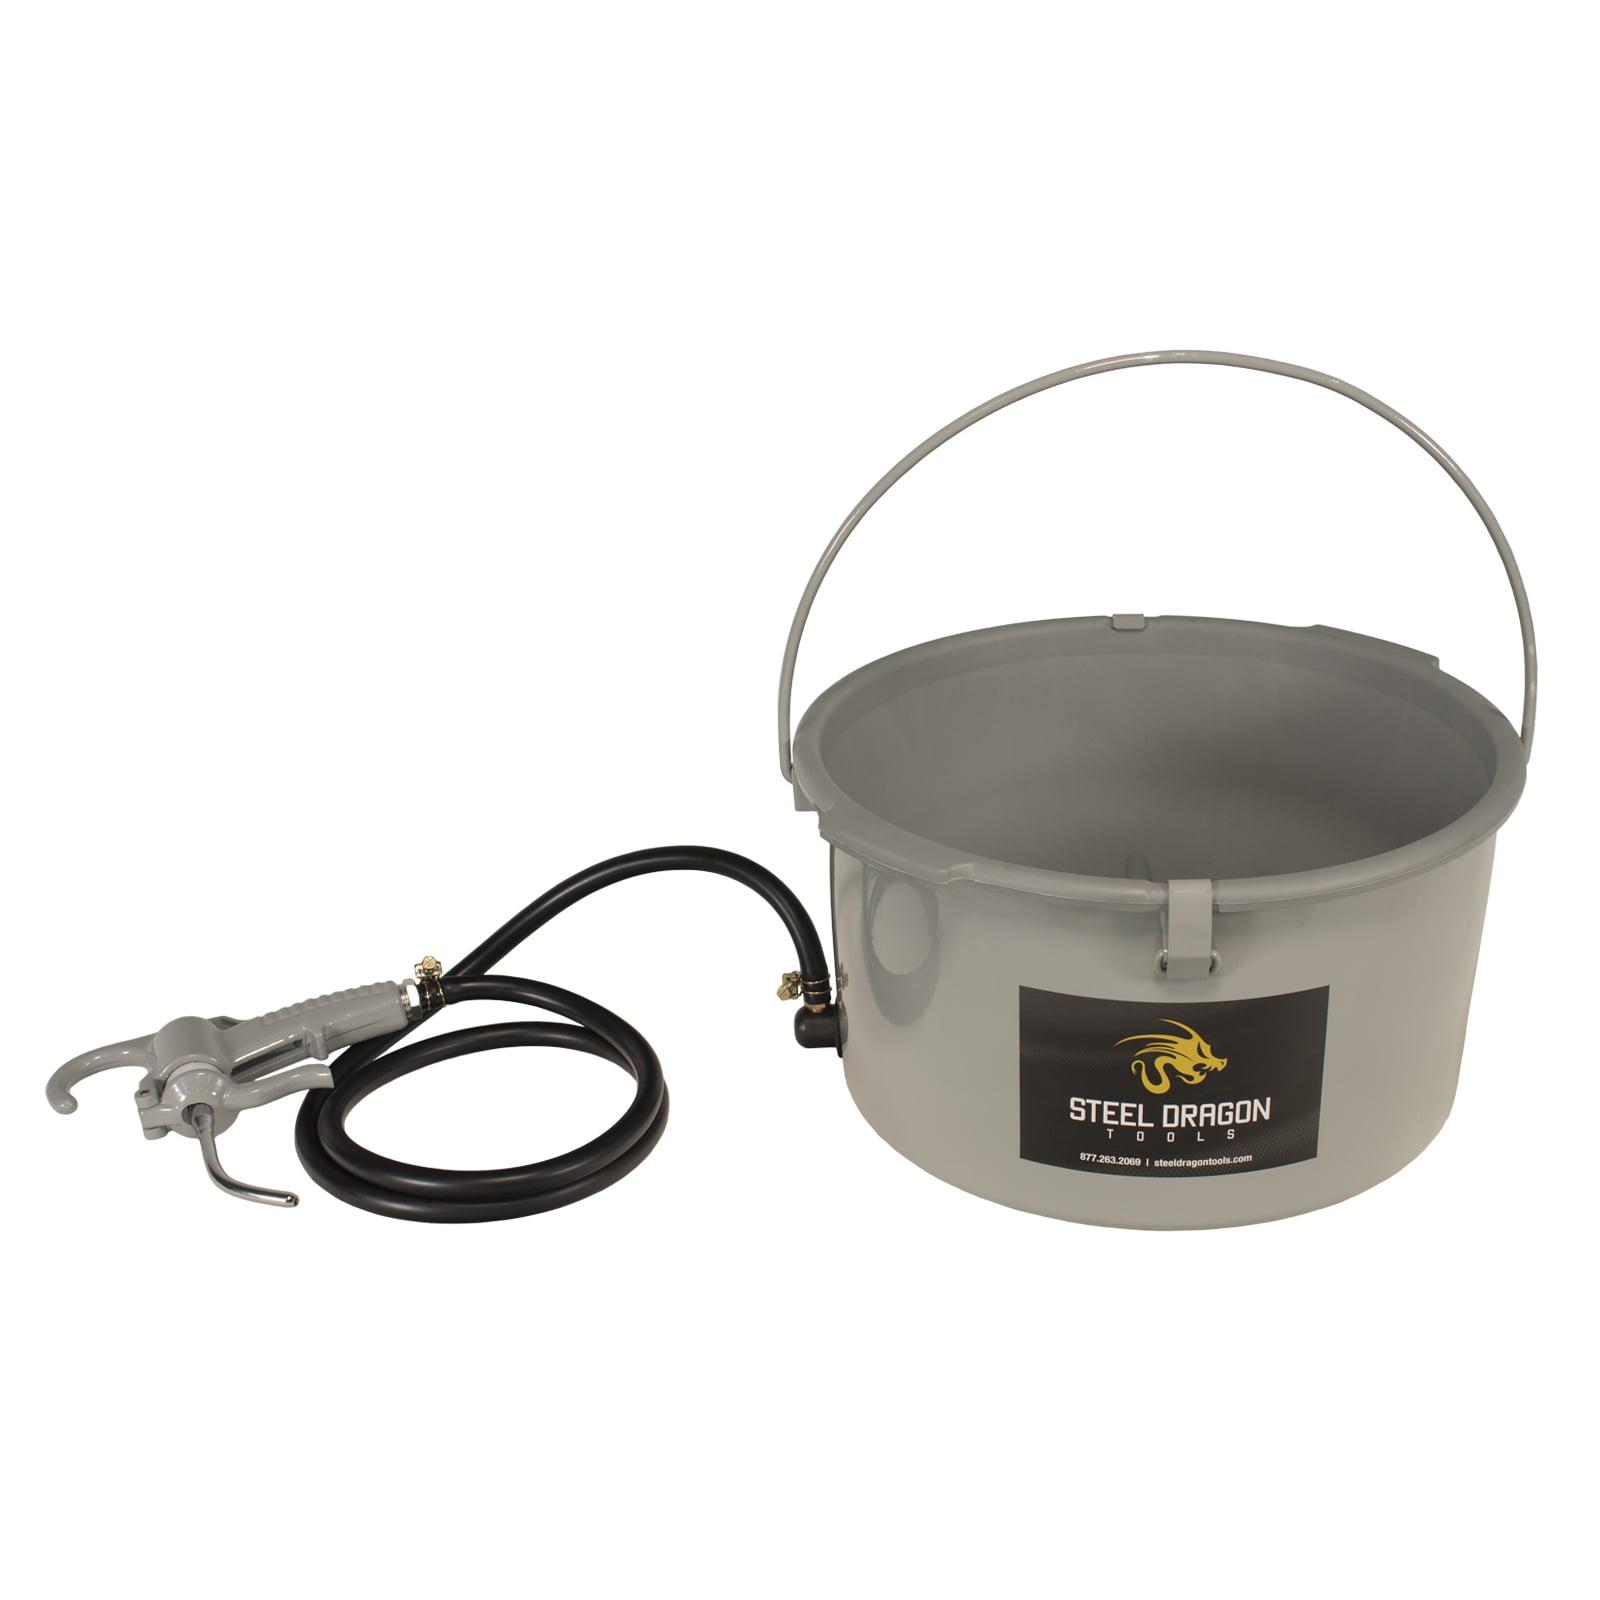 Steel Dragon 418 Handheld Oiler Bucket 10883 for RIDGID® ...